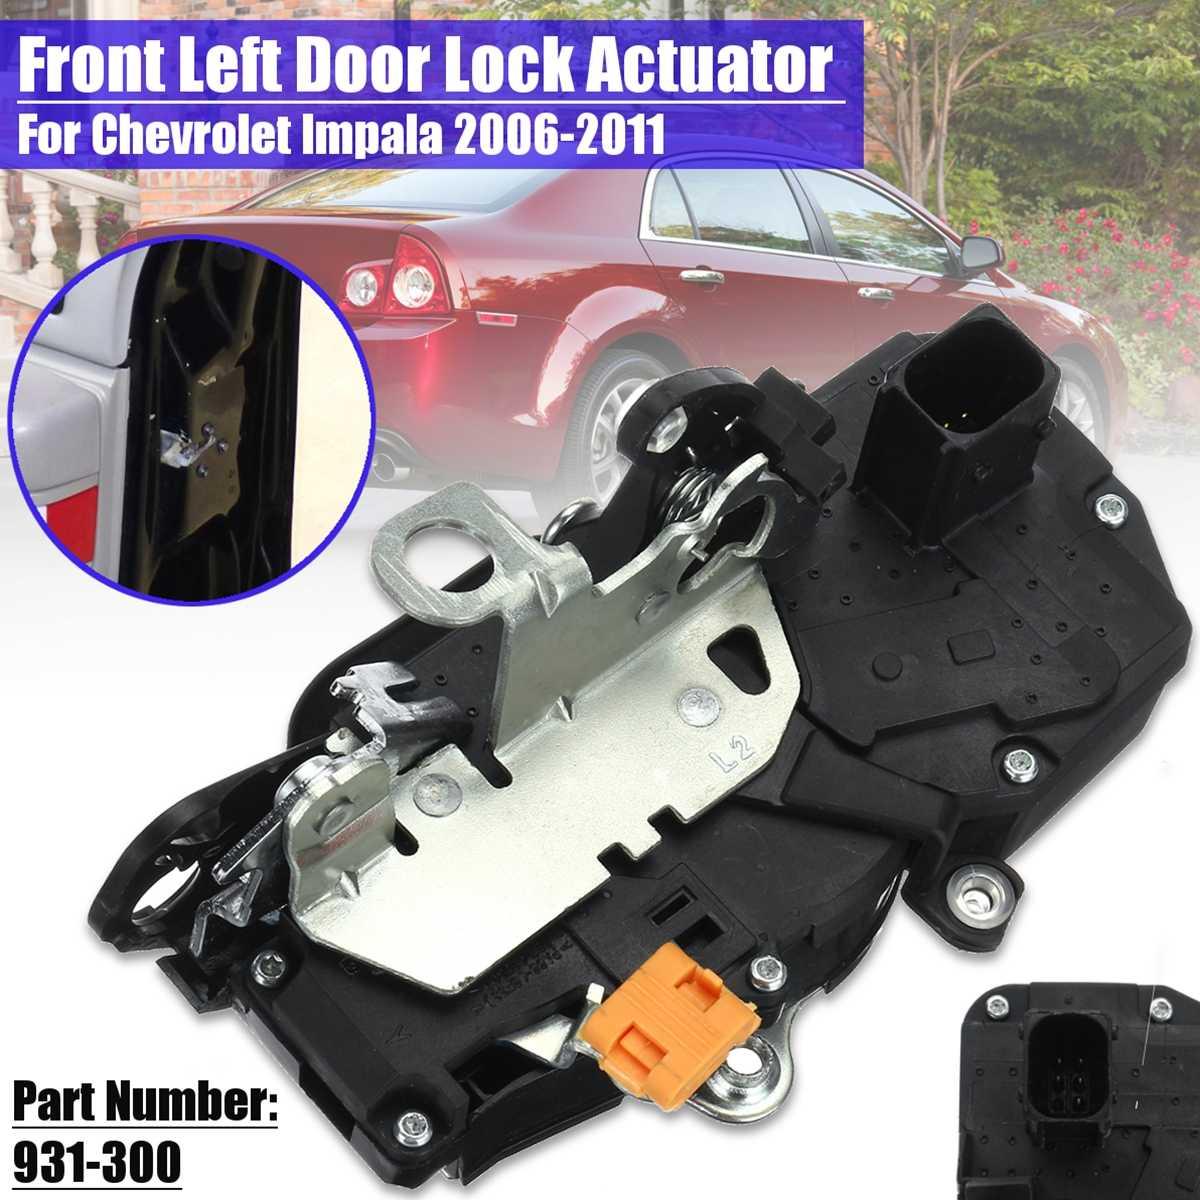 5 Pin Car Front Rear Power Door Lock Actuator For Chevrolet Impala 2006 2011 931 300 931 305 931 332 931 333